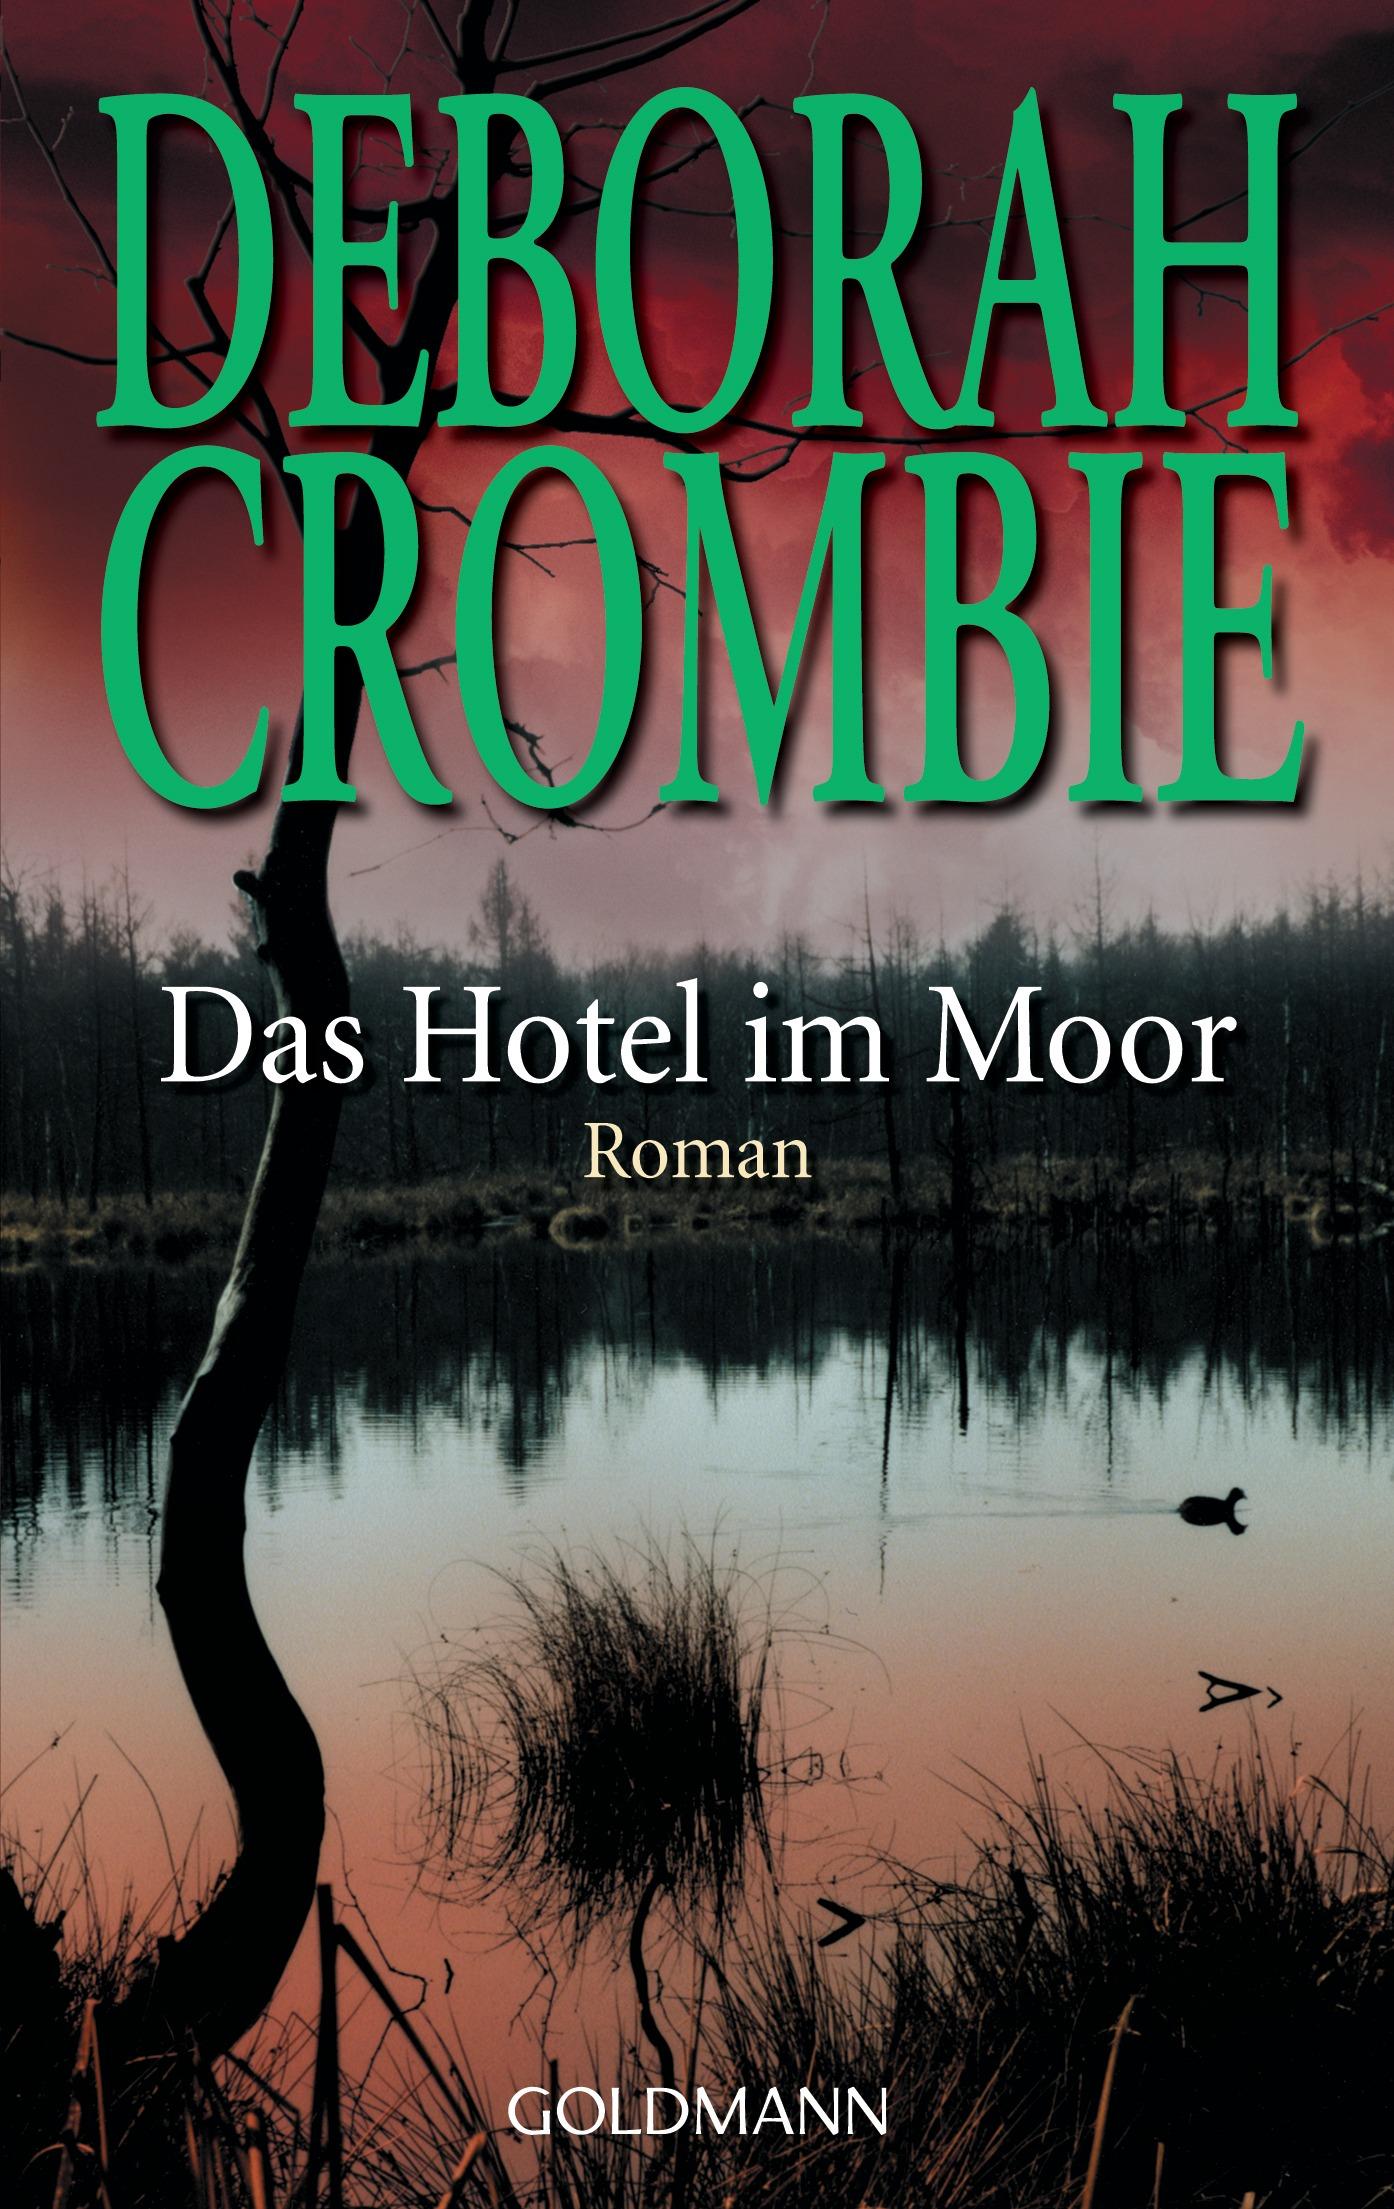 Das Hotel im Moor - Deborah Crombie